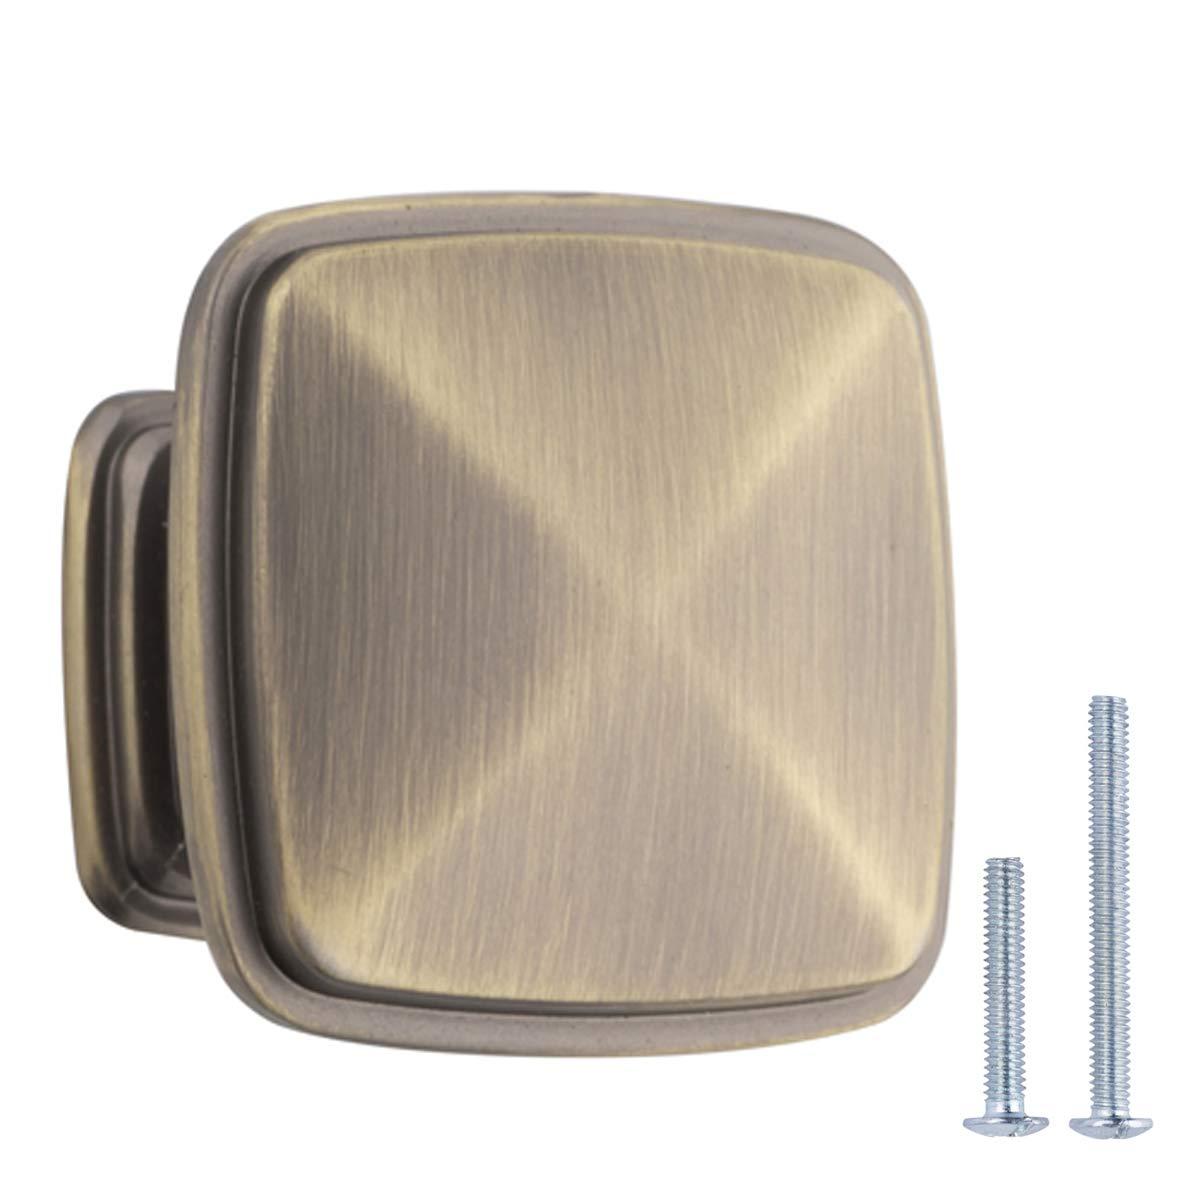 "AmazonBasics AB400-AB-25 Cabinet Knob, 1.25"" Diameter, Antique Brass"